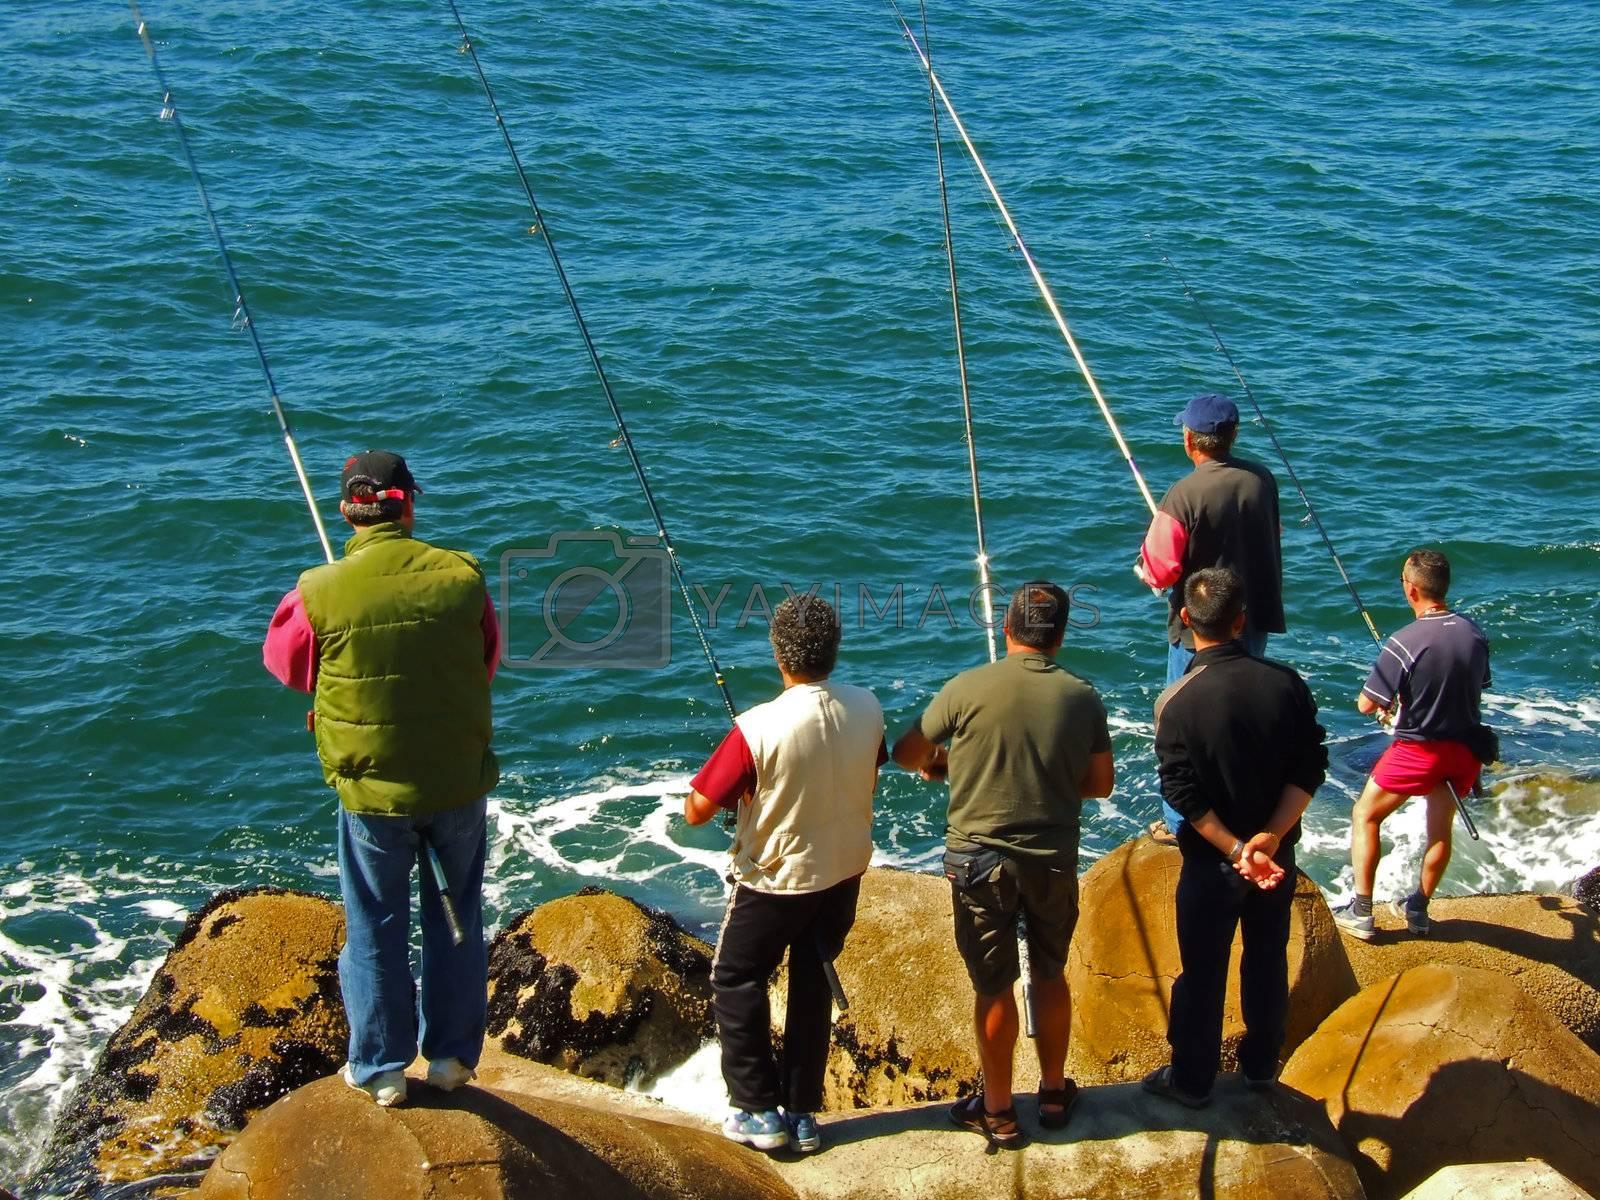 Fishermans  by PauloResende